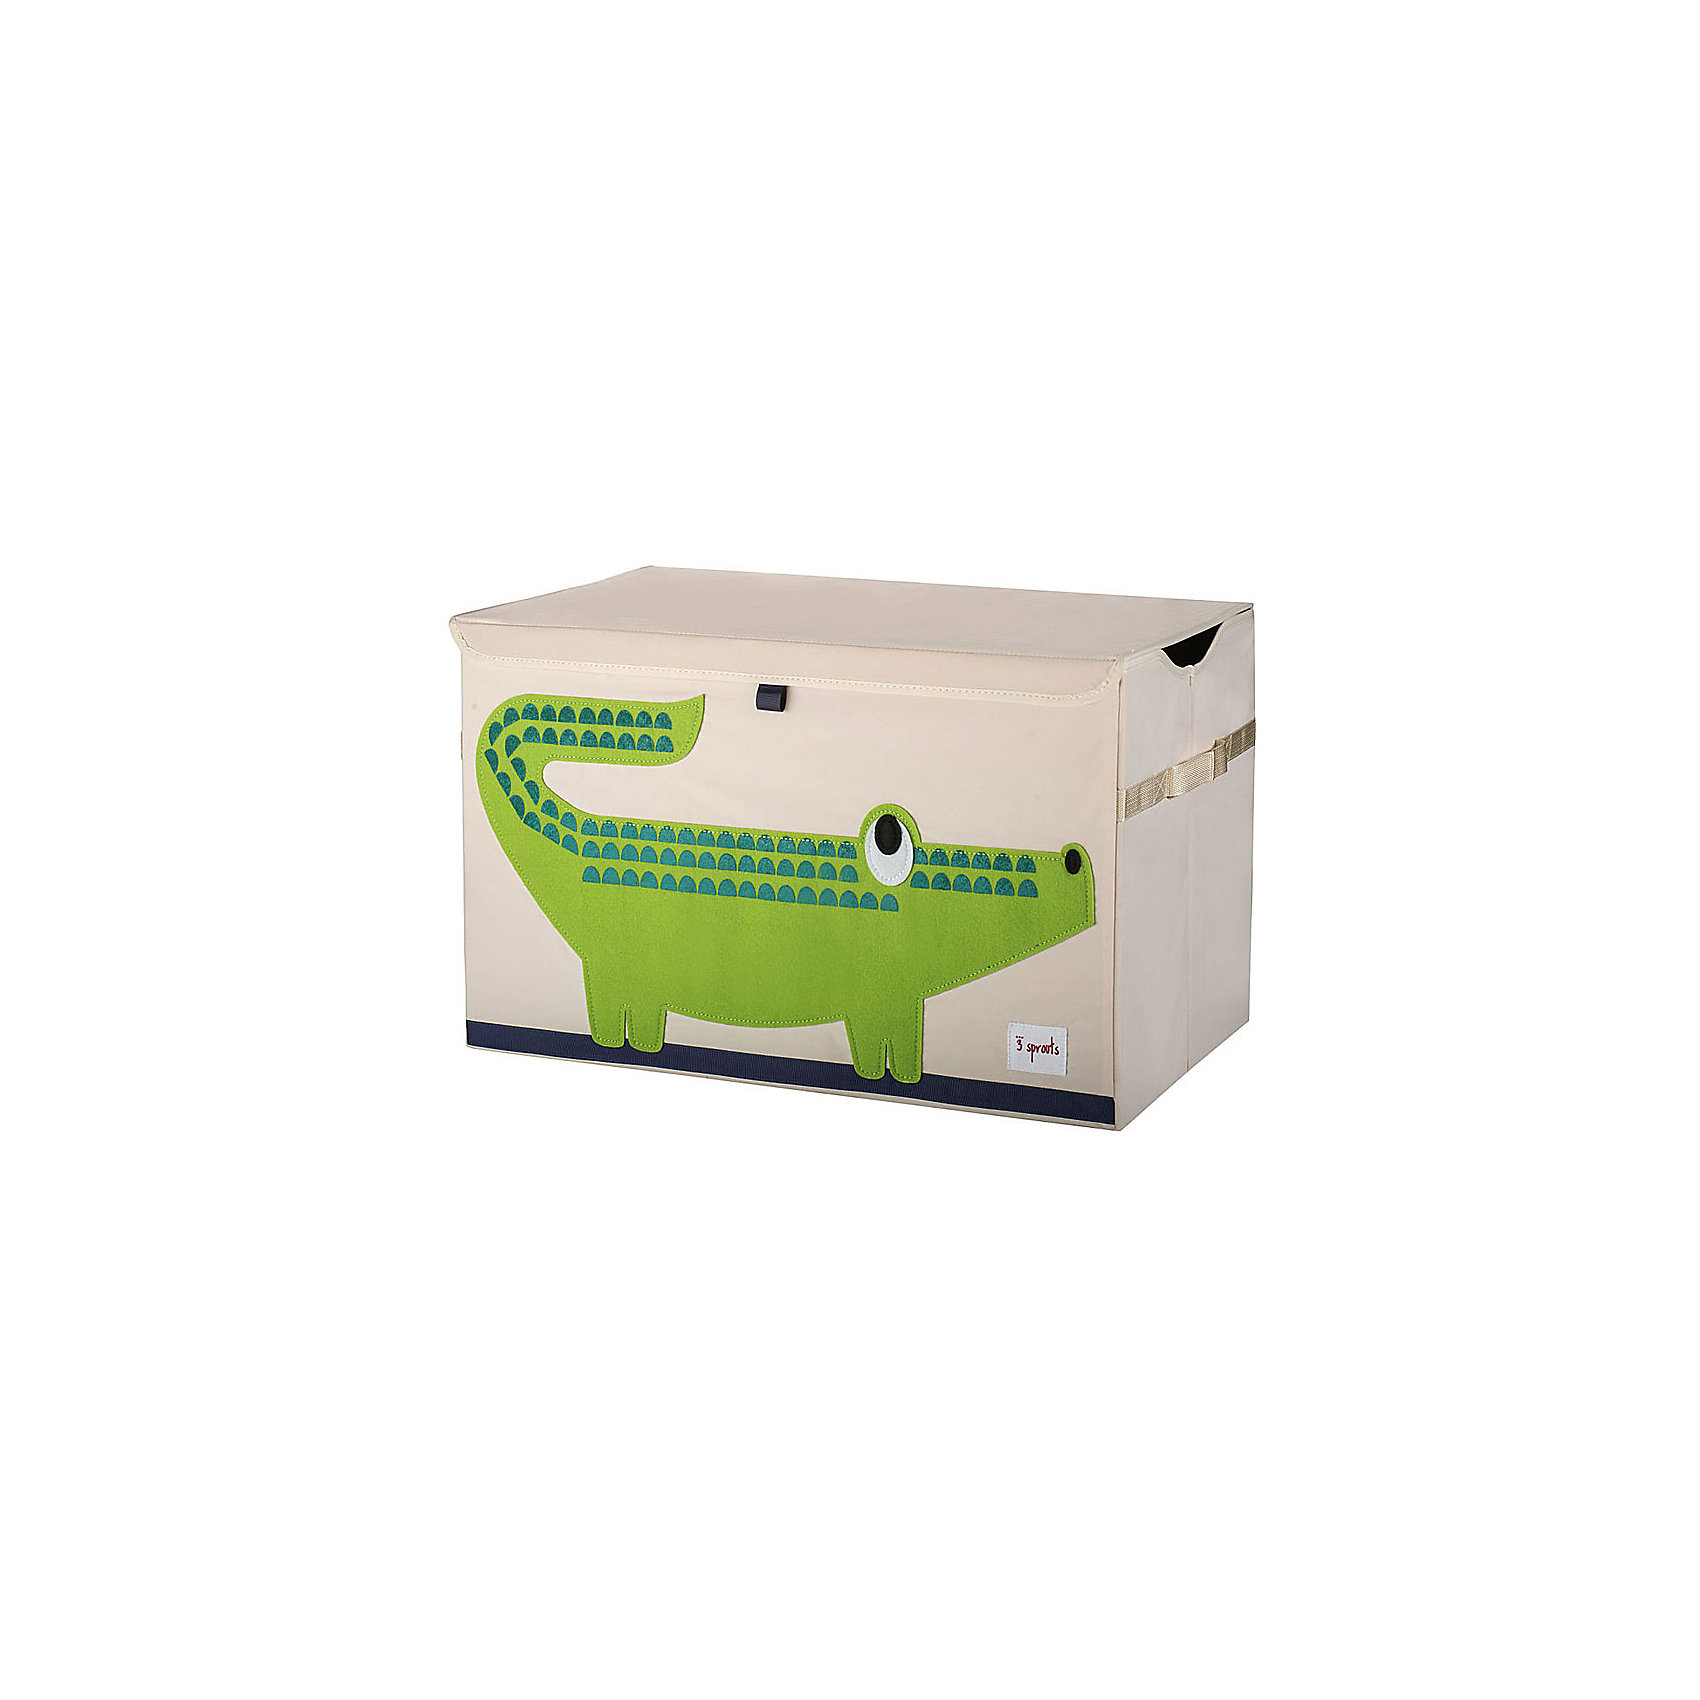 3 Sprouts Сундук для хранения игрушек Крокодил (Green Crocodile), 3 Sprouts